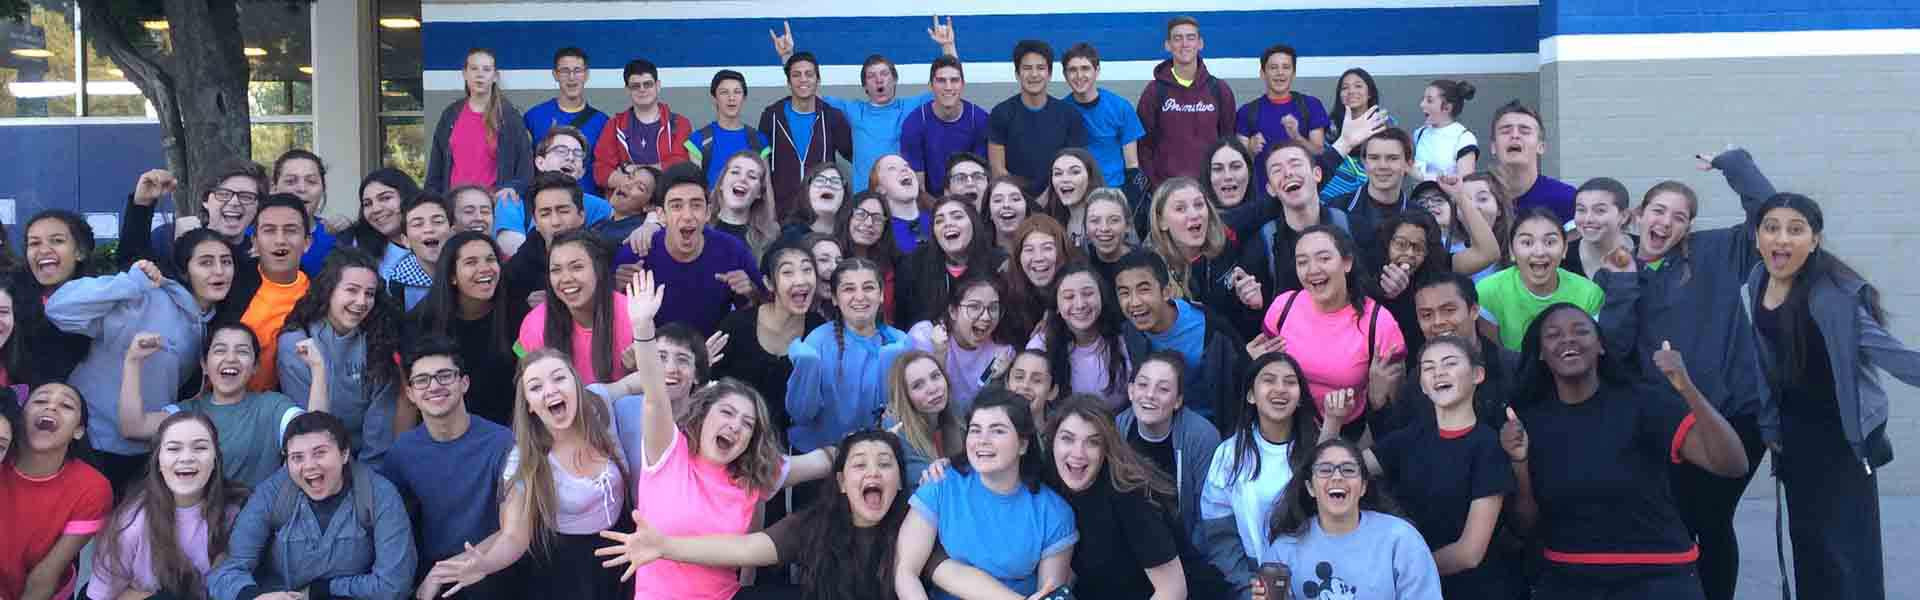 Elcaminoreal-Highschool-CA-Group-Banner-Main